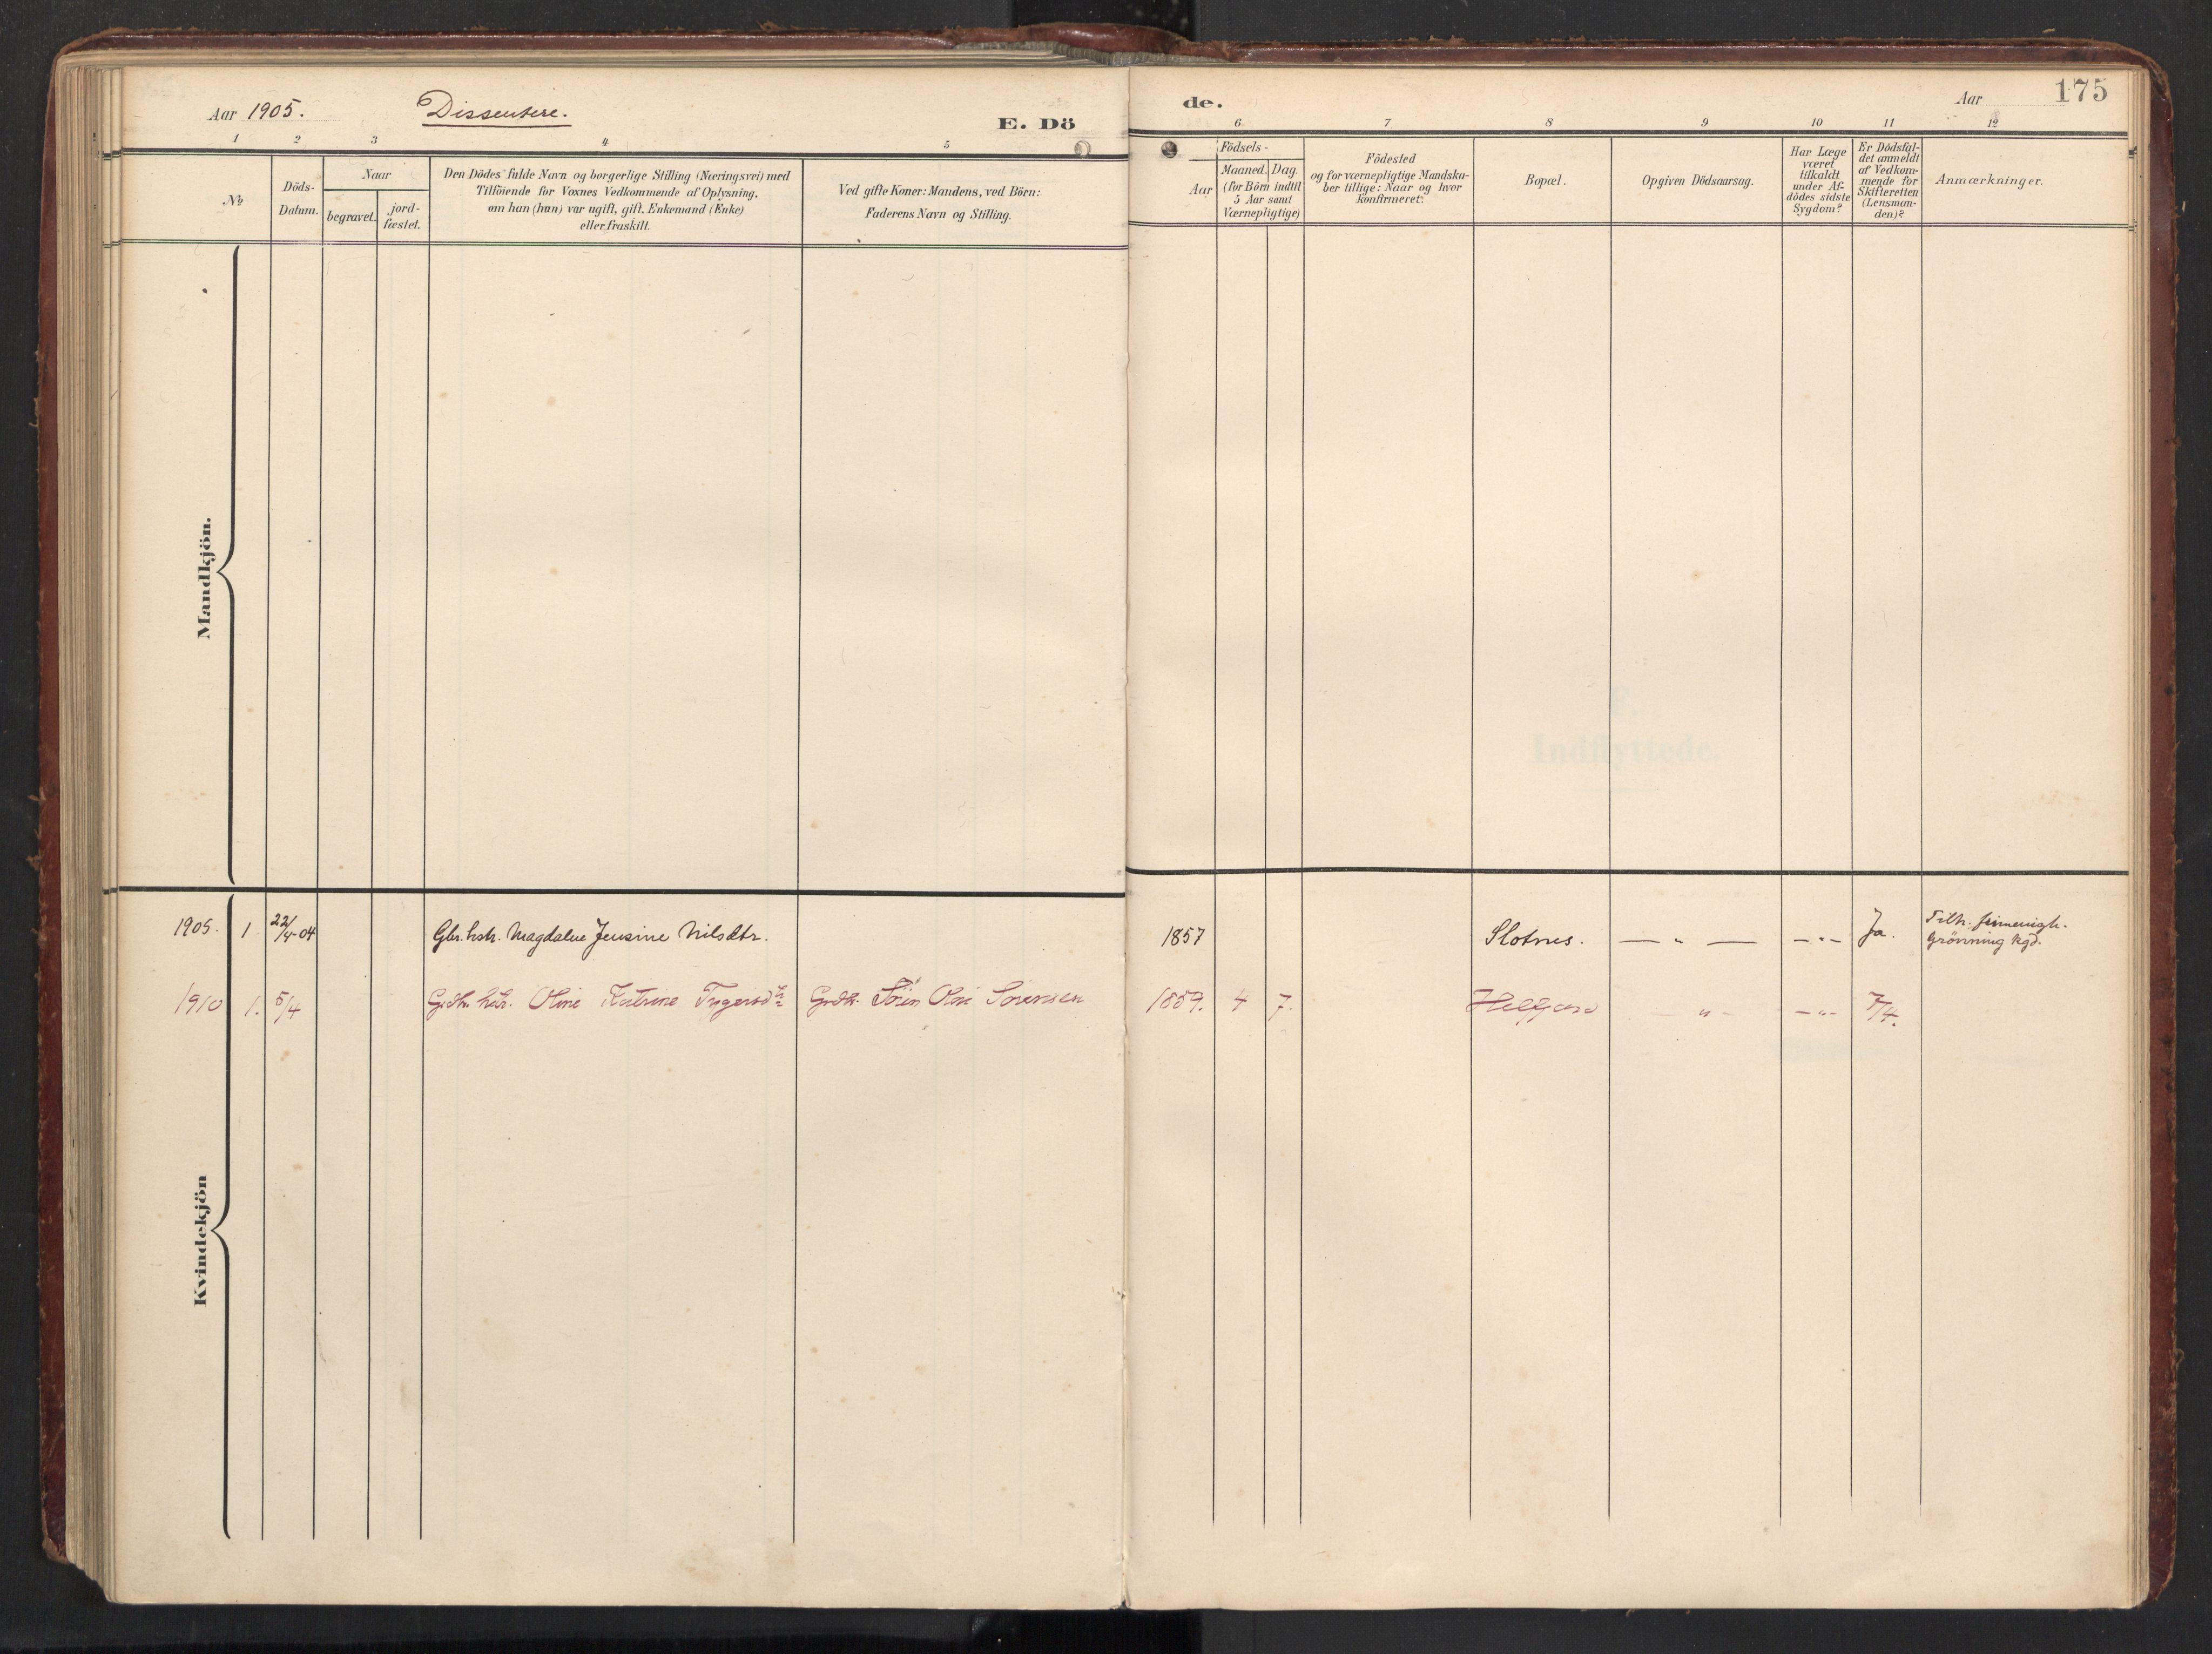 SAT, Ministerialprotokoller, klokkerbøker og fødselsregistre - Nordland, 890/L1287: Ministerialbok nr. 890A02, 1903-1915, s. 175